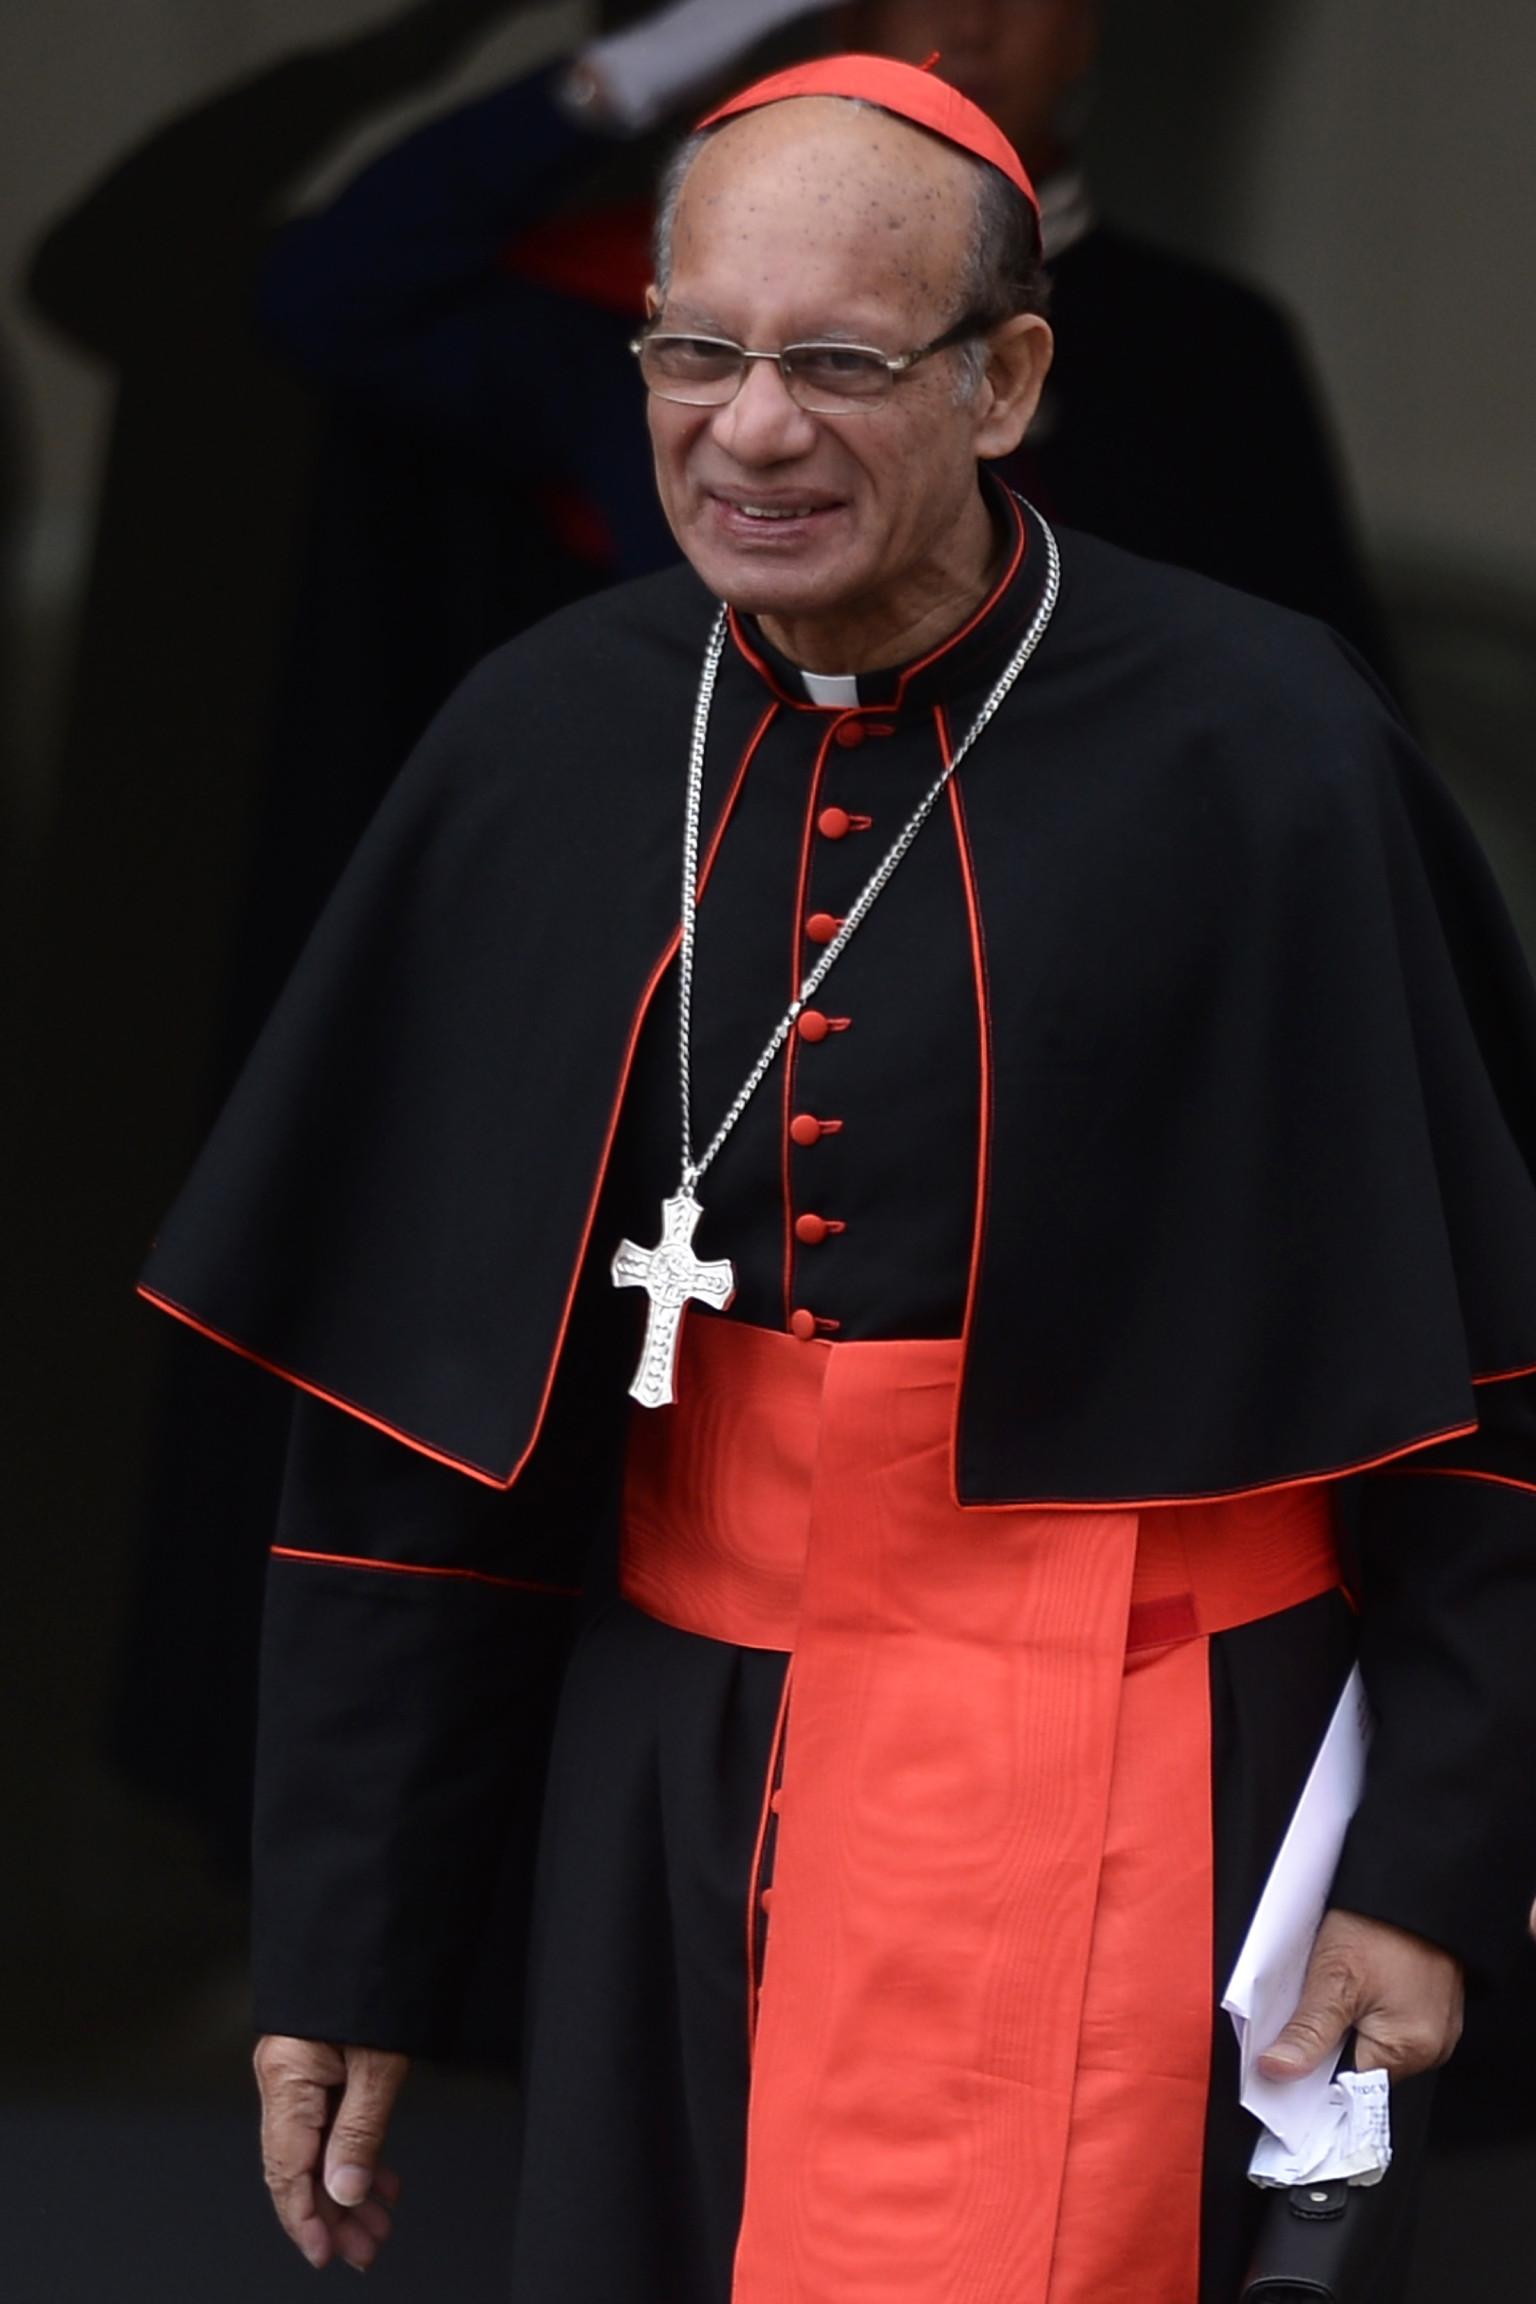 Indian Cardinal Oswald Gracias Reaches Out To Lgtb Group